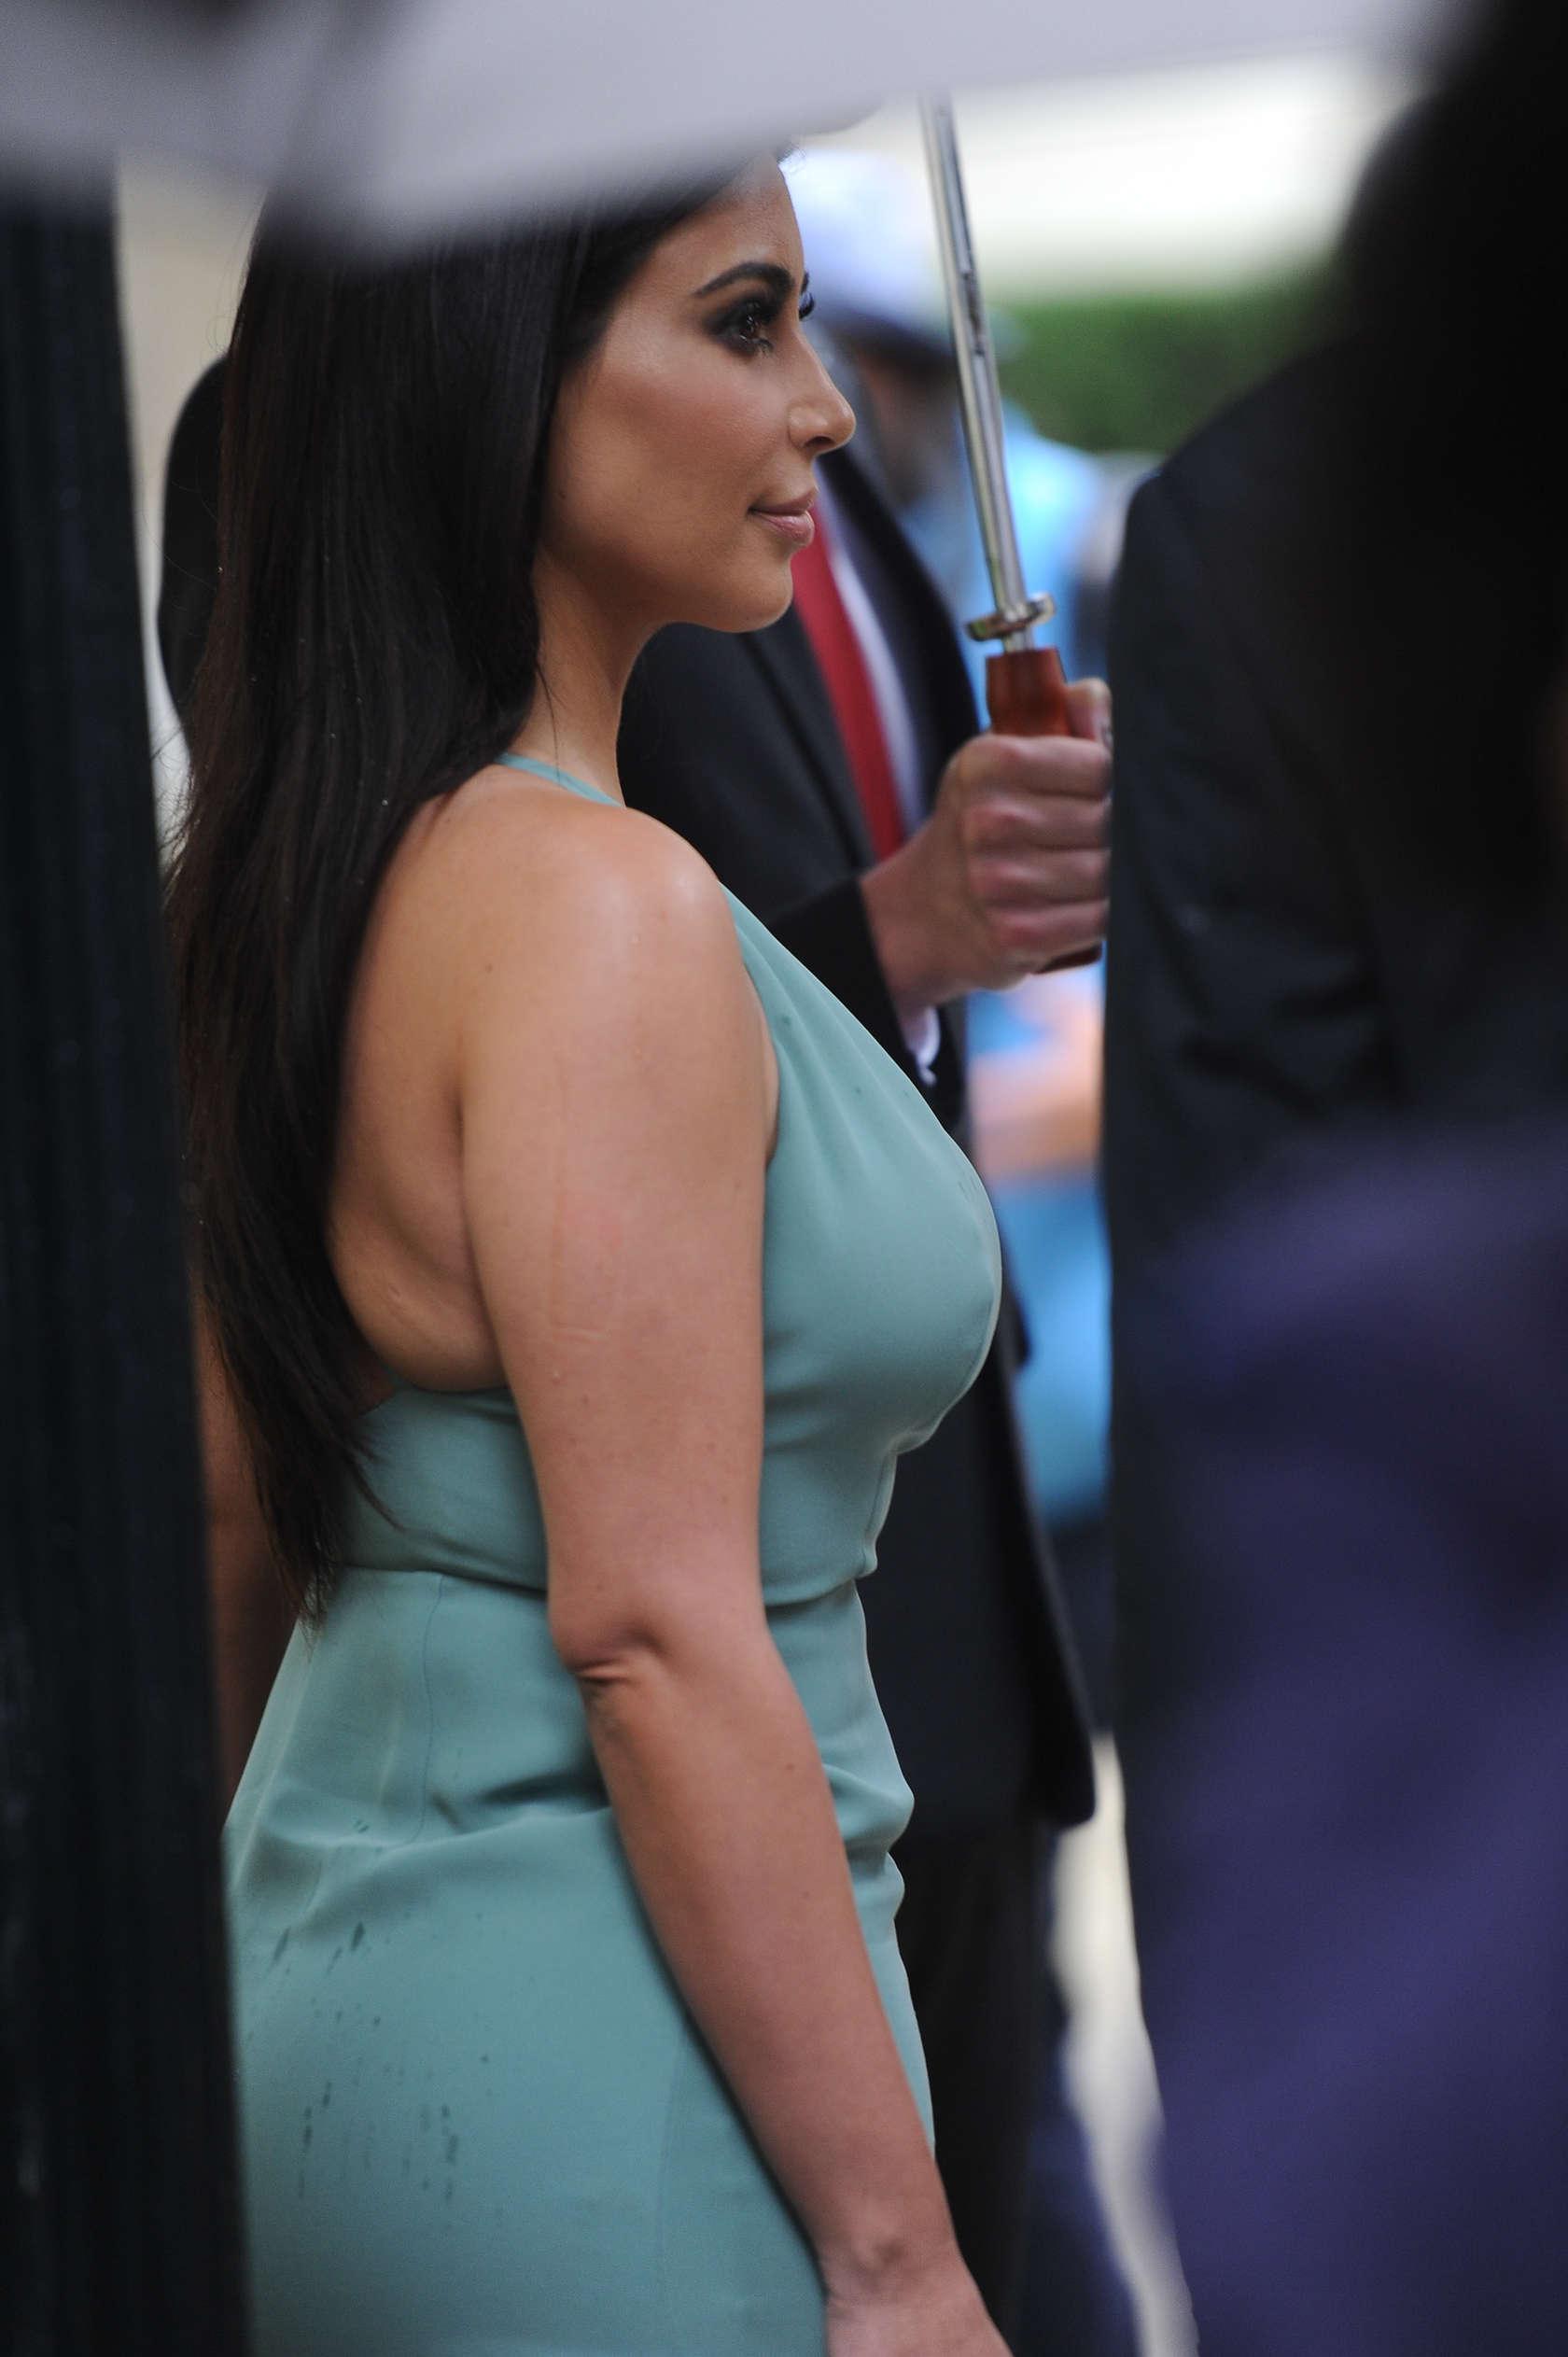 Kim Kardashian Bandage Bikini - Kim Kardashian Phenomenal Star